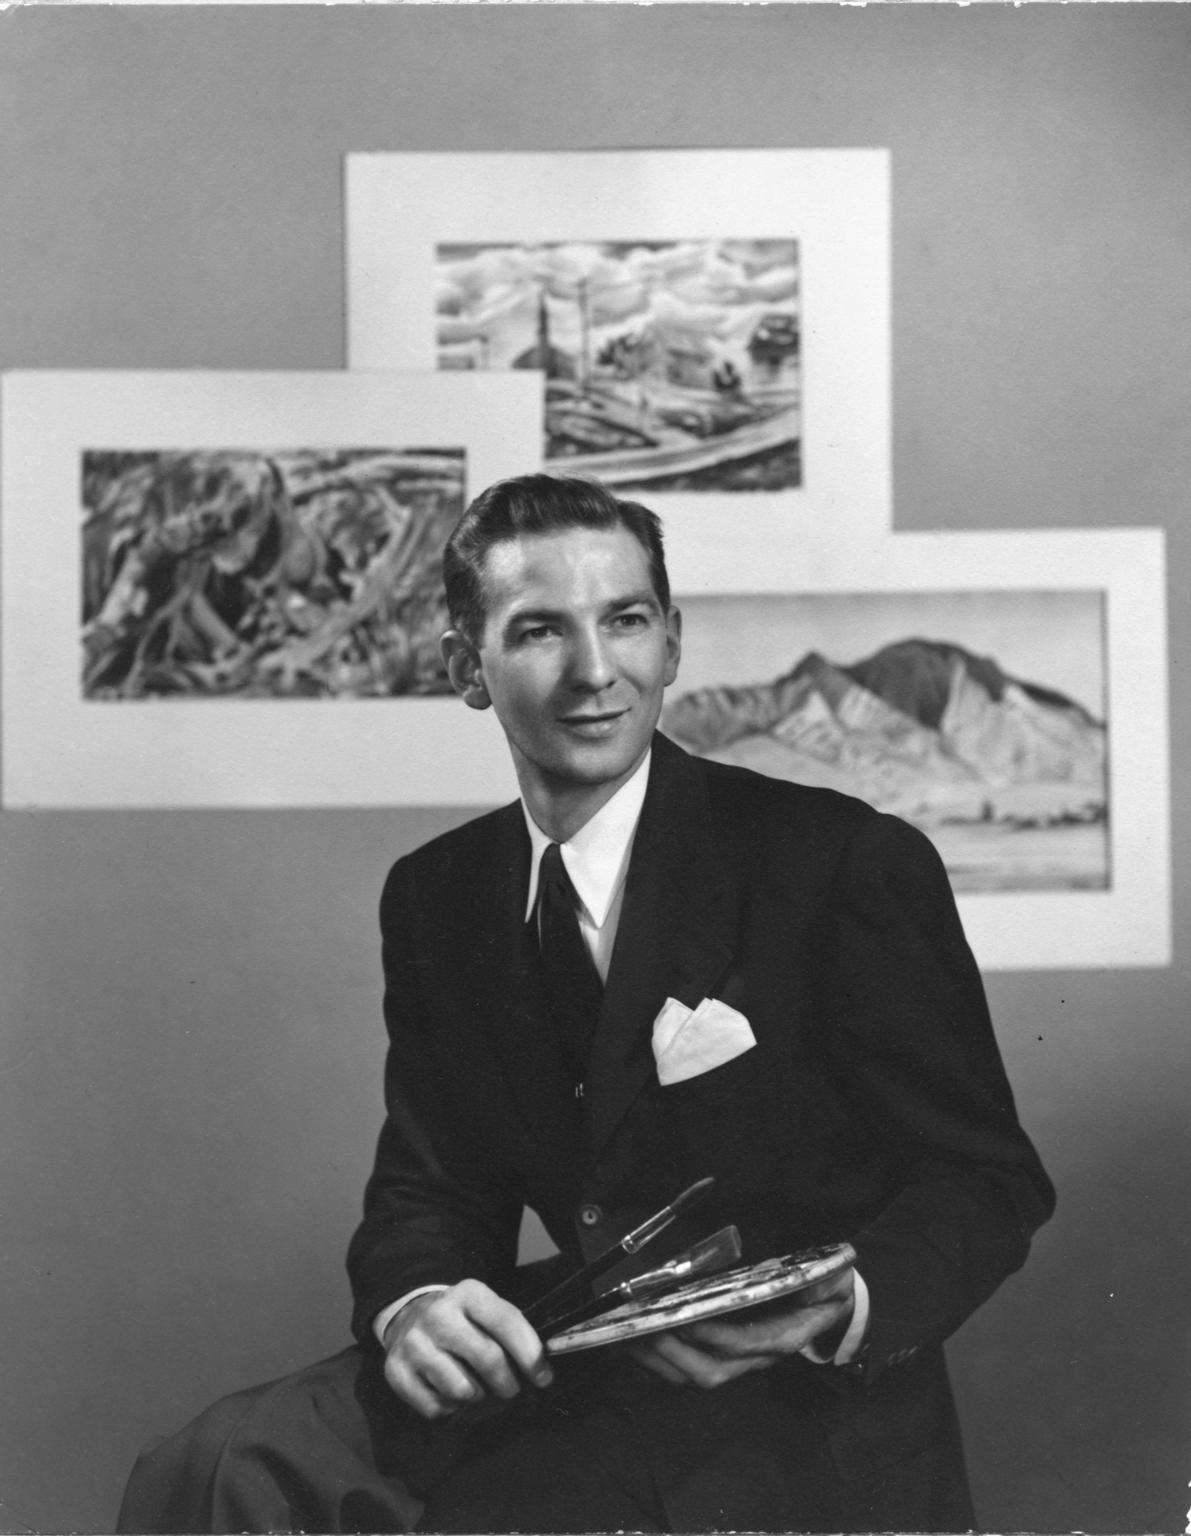 Stanley Witmeyer